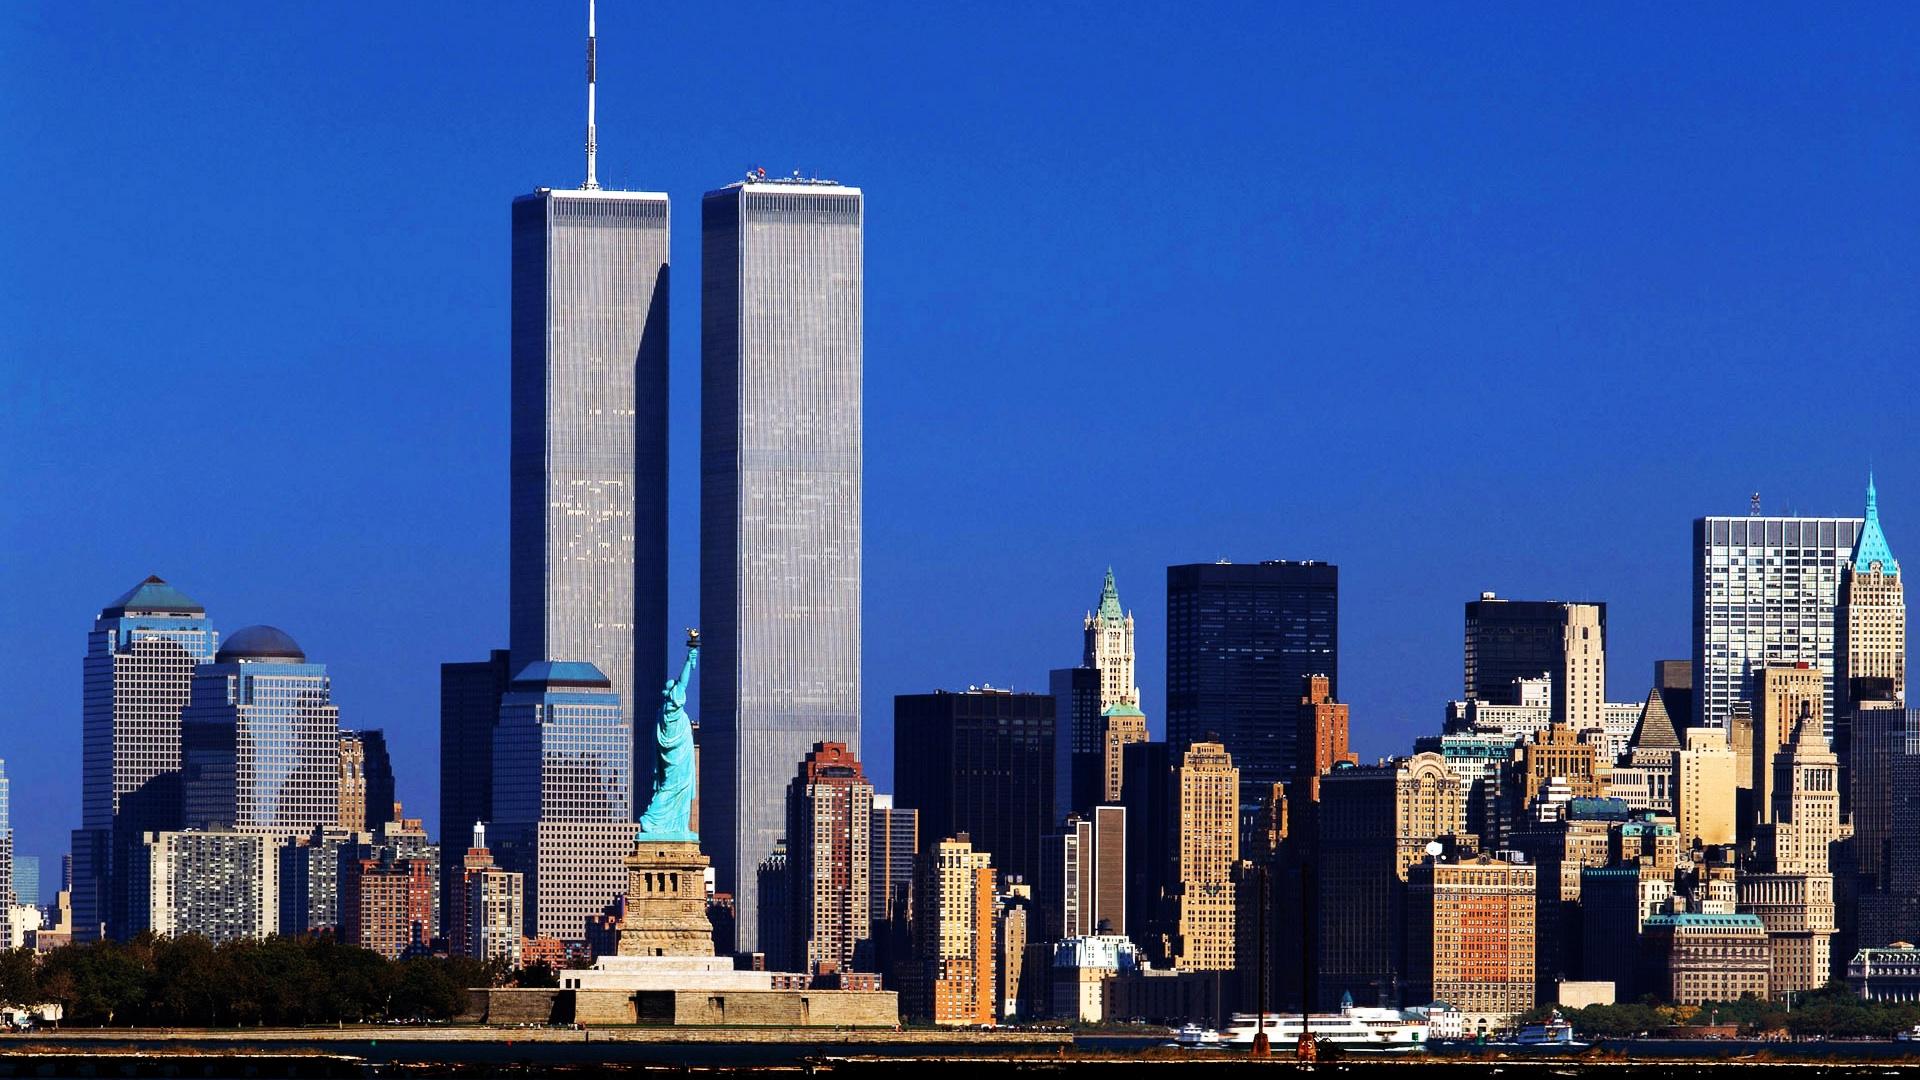 My memories of 9/11 16-years later